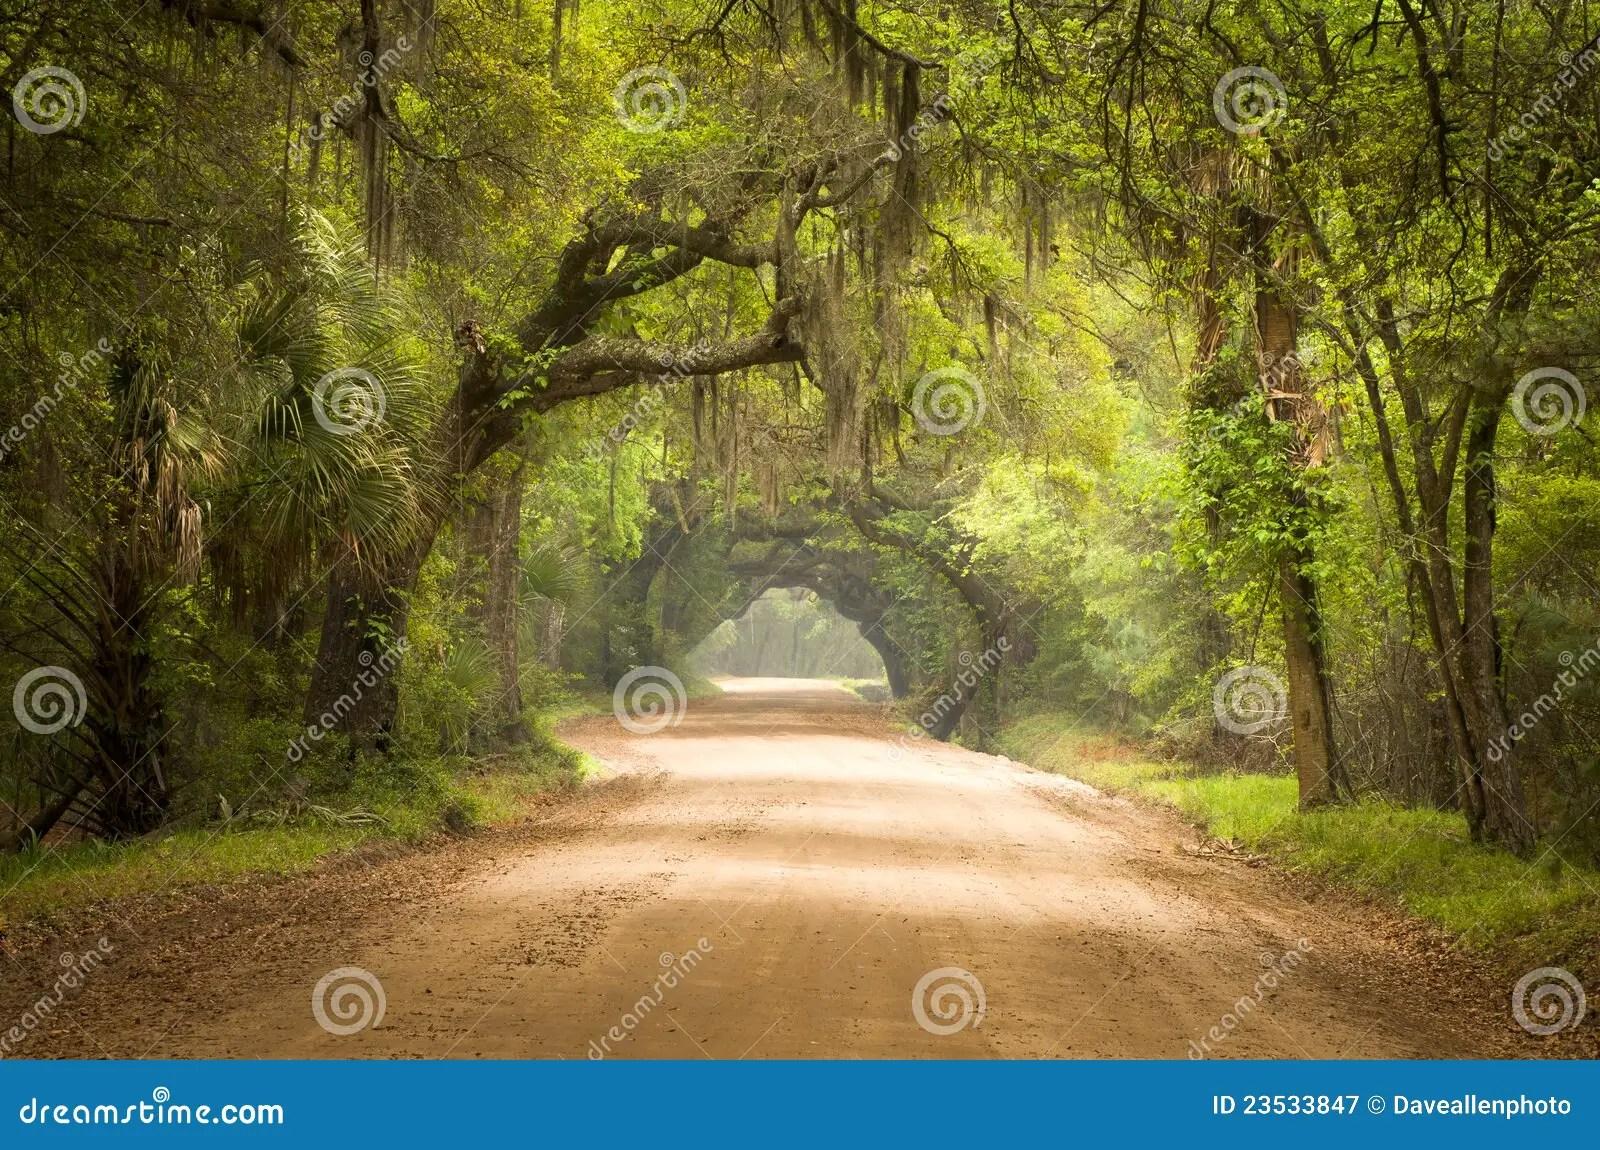 Fall 4k Wallpaper Charleston Sc Dirt Road Forest Deep South Moss Stock Image